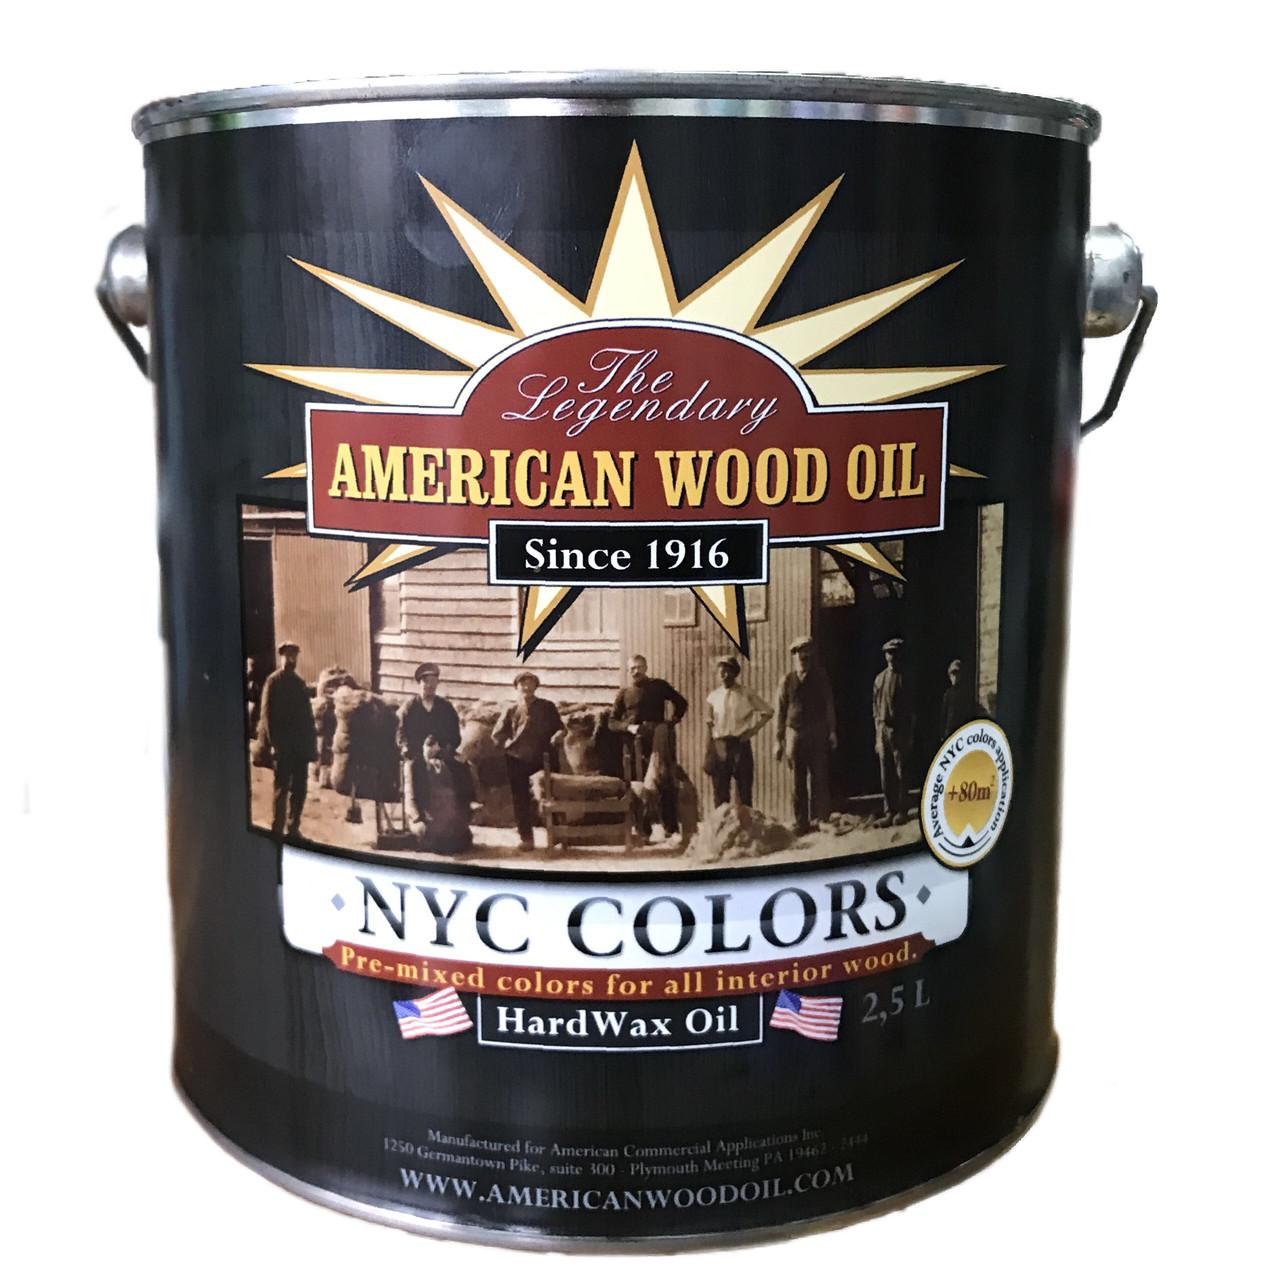 Масло-віск American Wood Oil Hard Wax Oil NYC Colors 2.5л Passaic